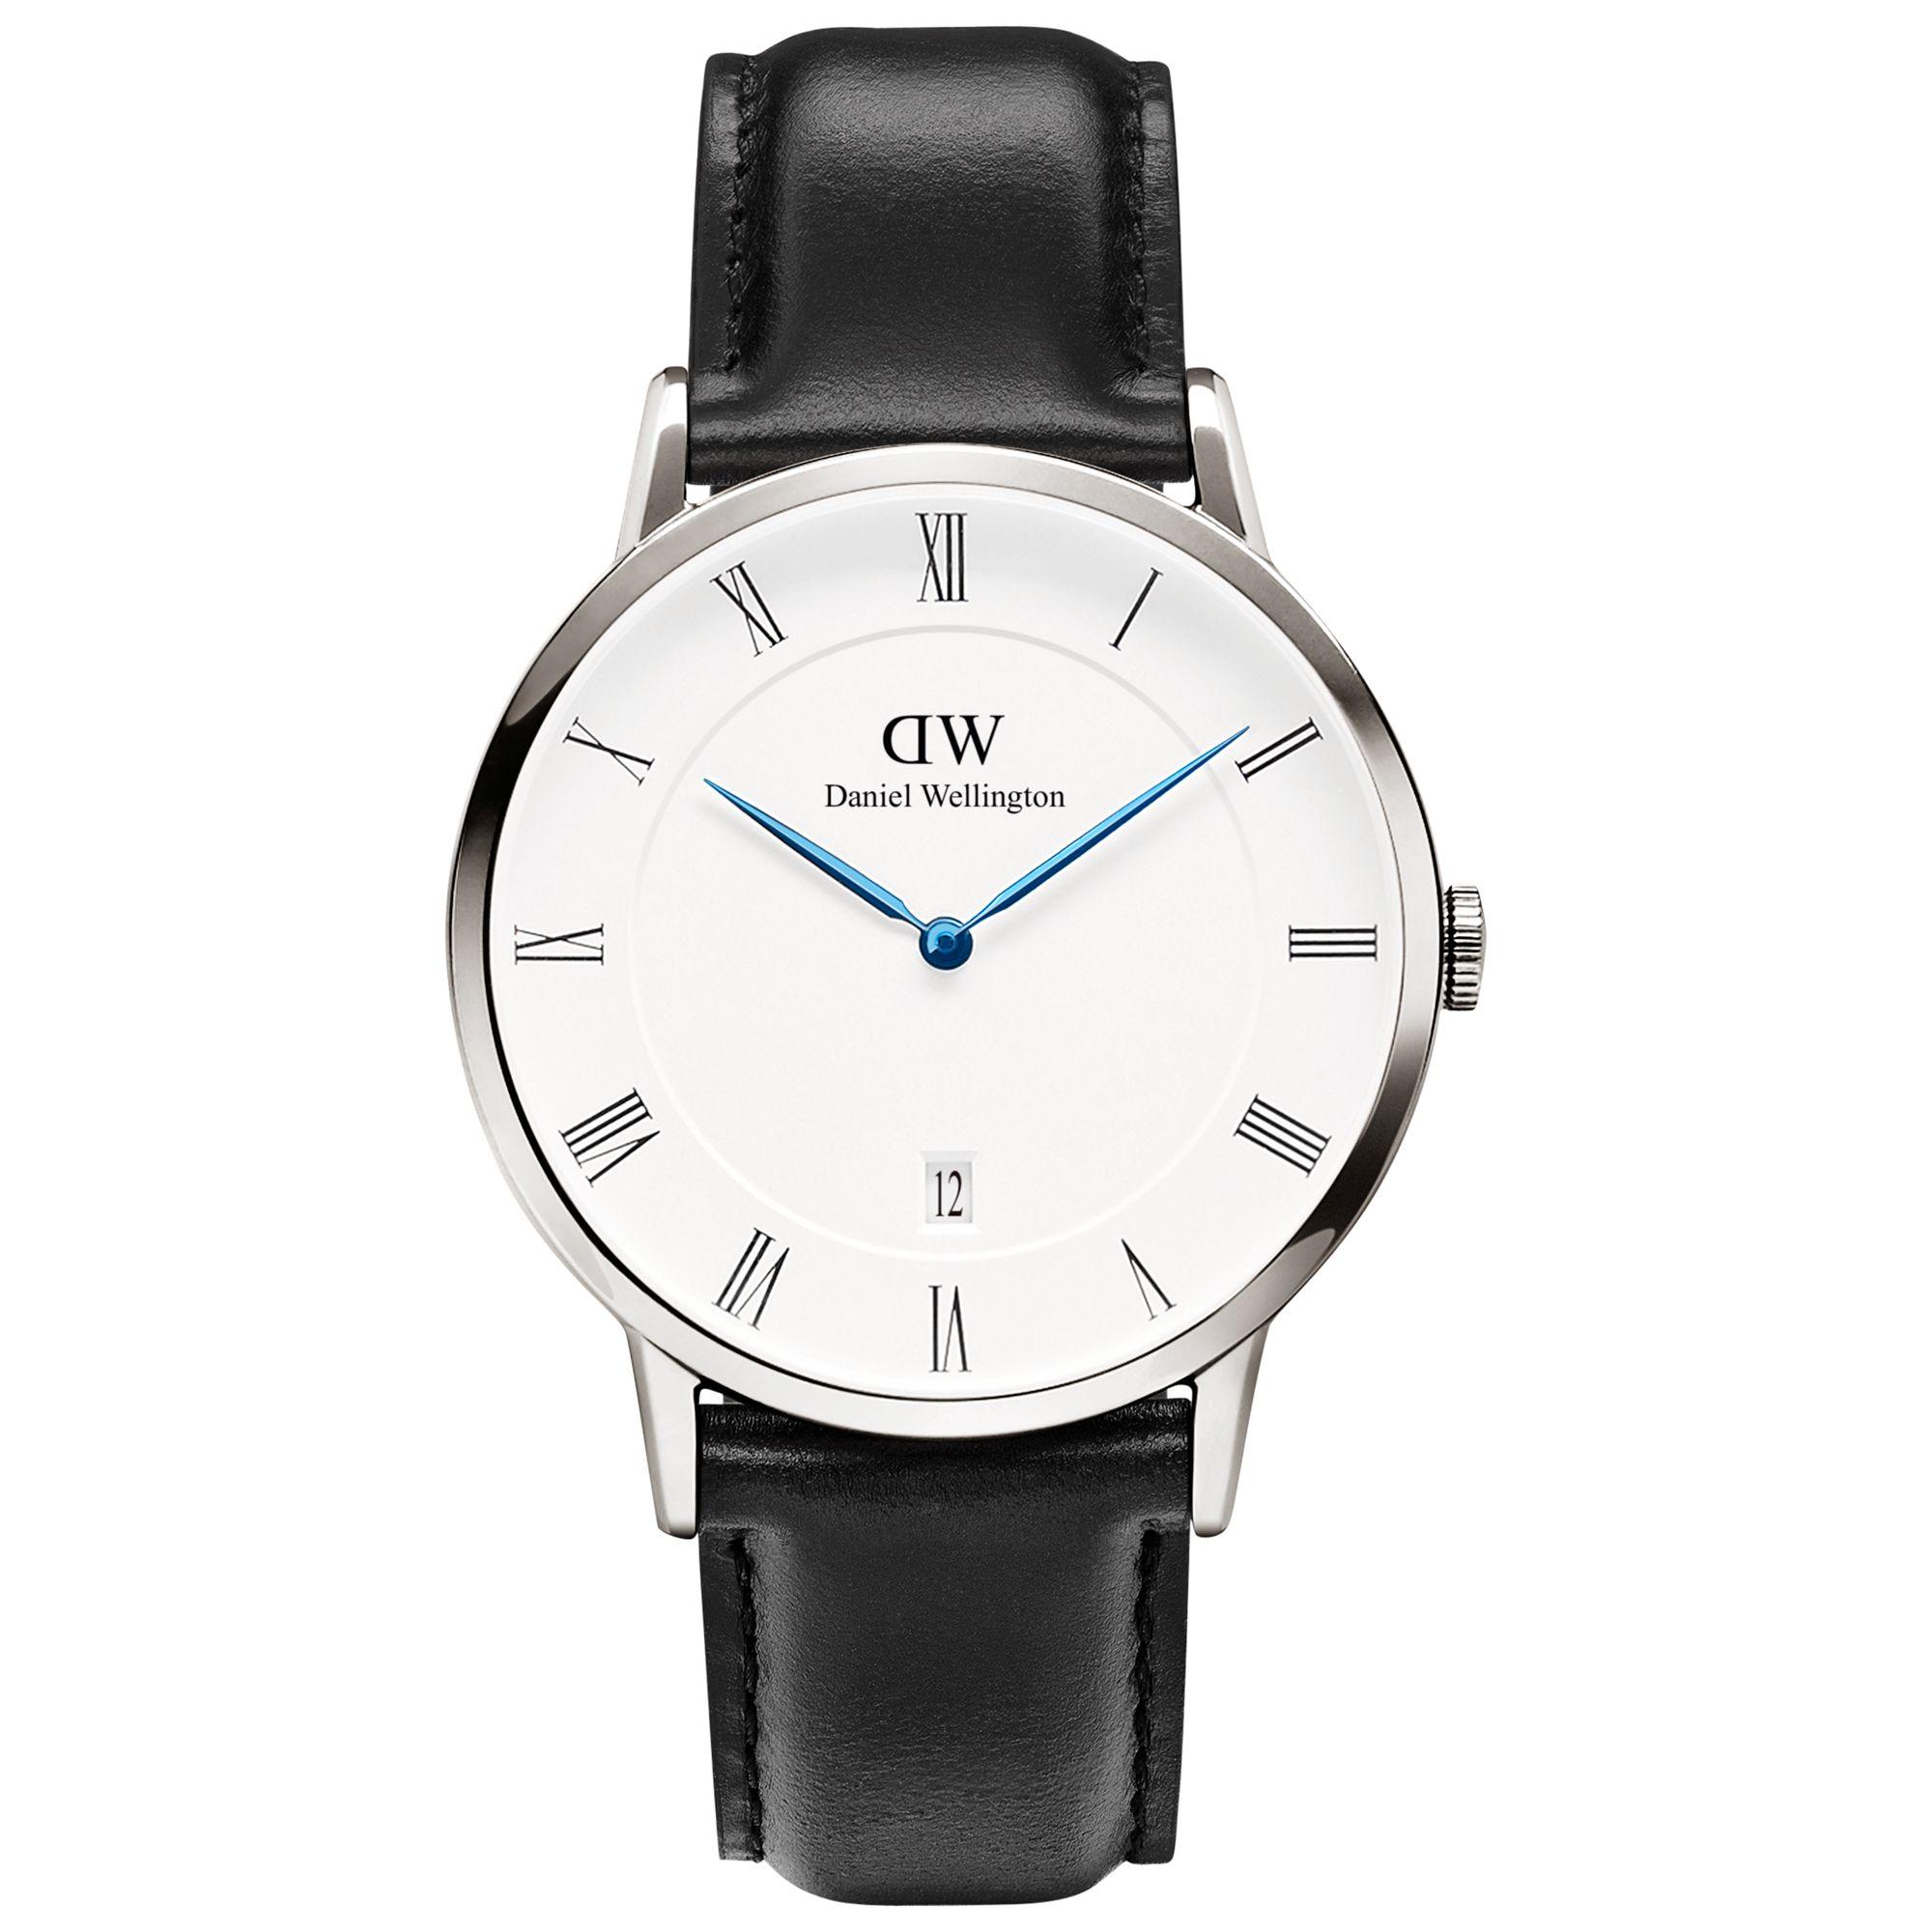 Daniel Wellington Daniel Wellington 1121DW Unisex Dapper Leather Strap Watch, Black/White